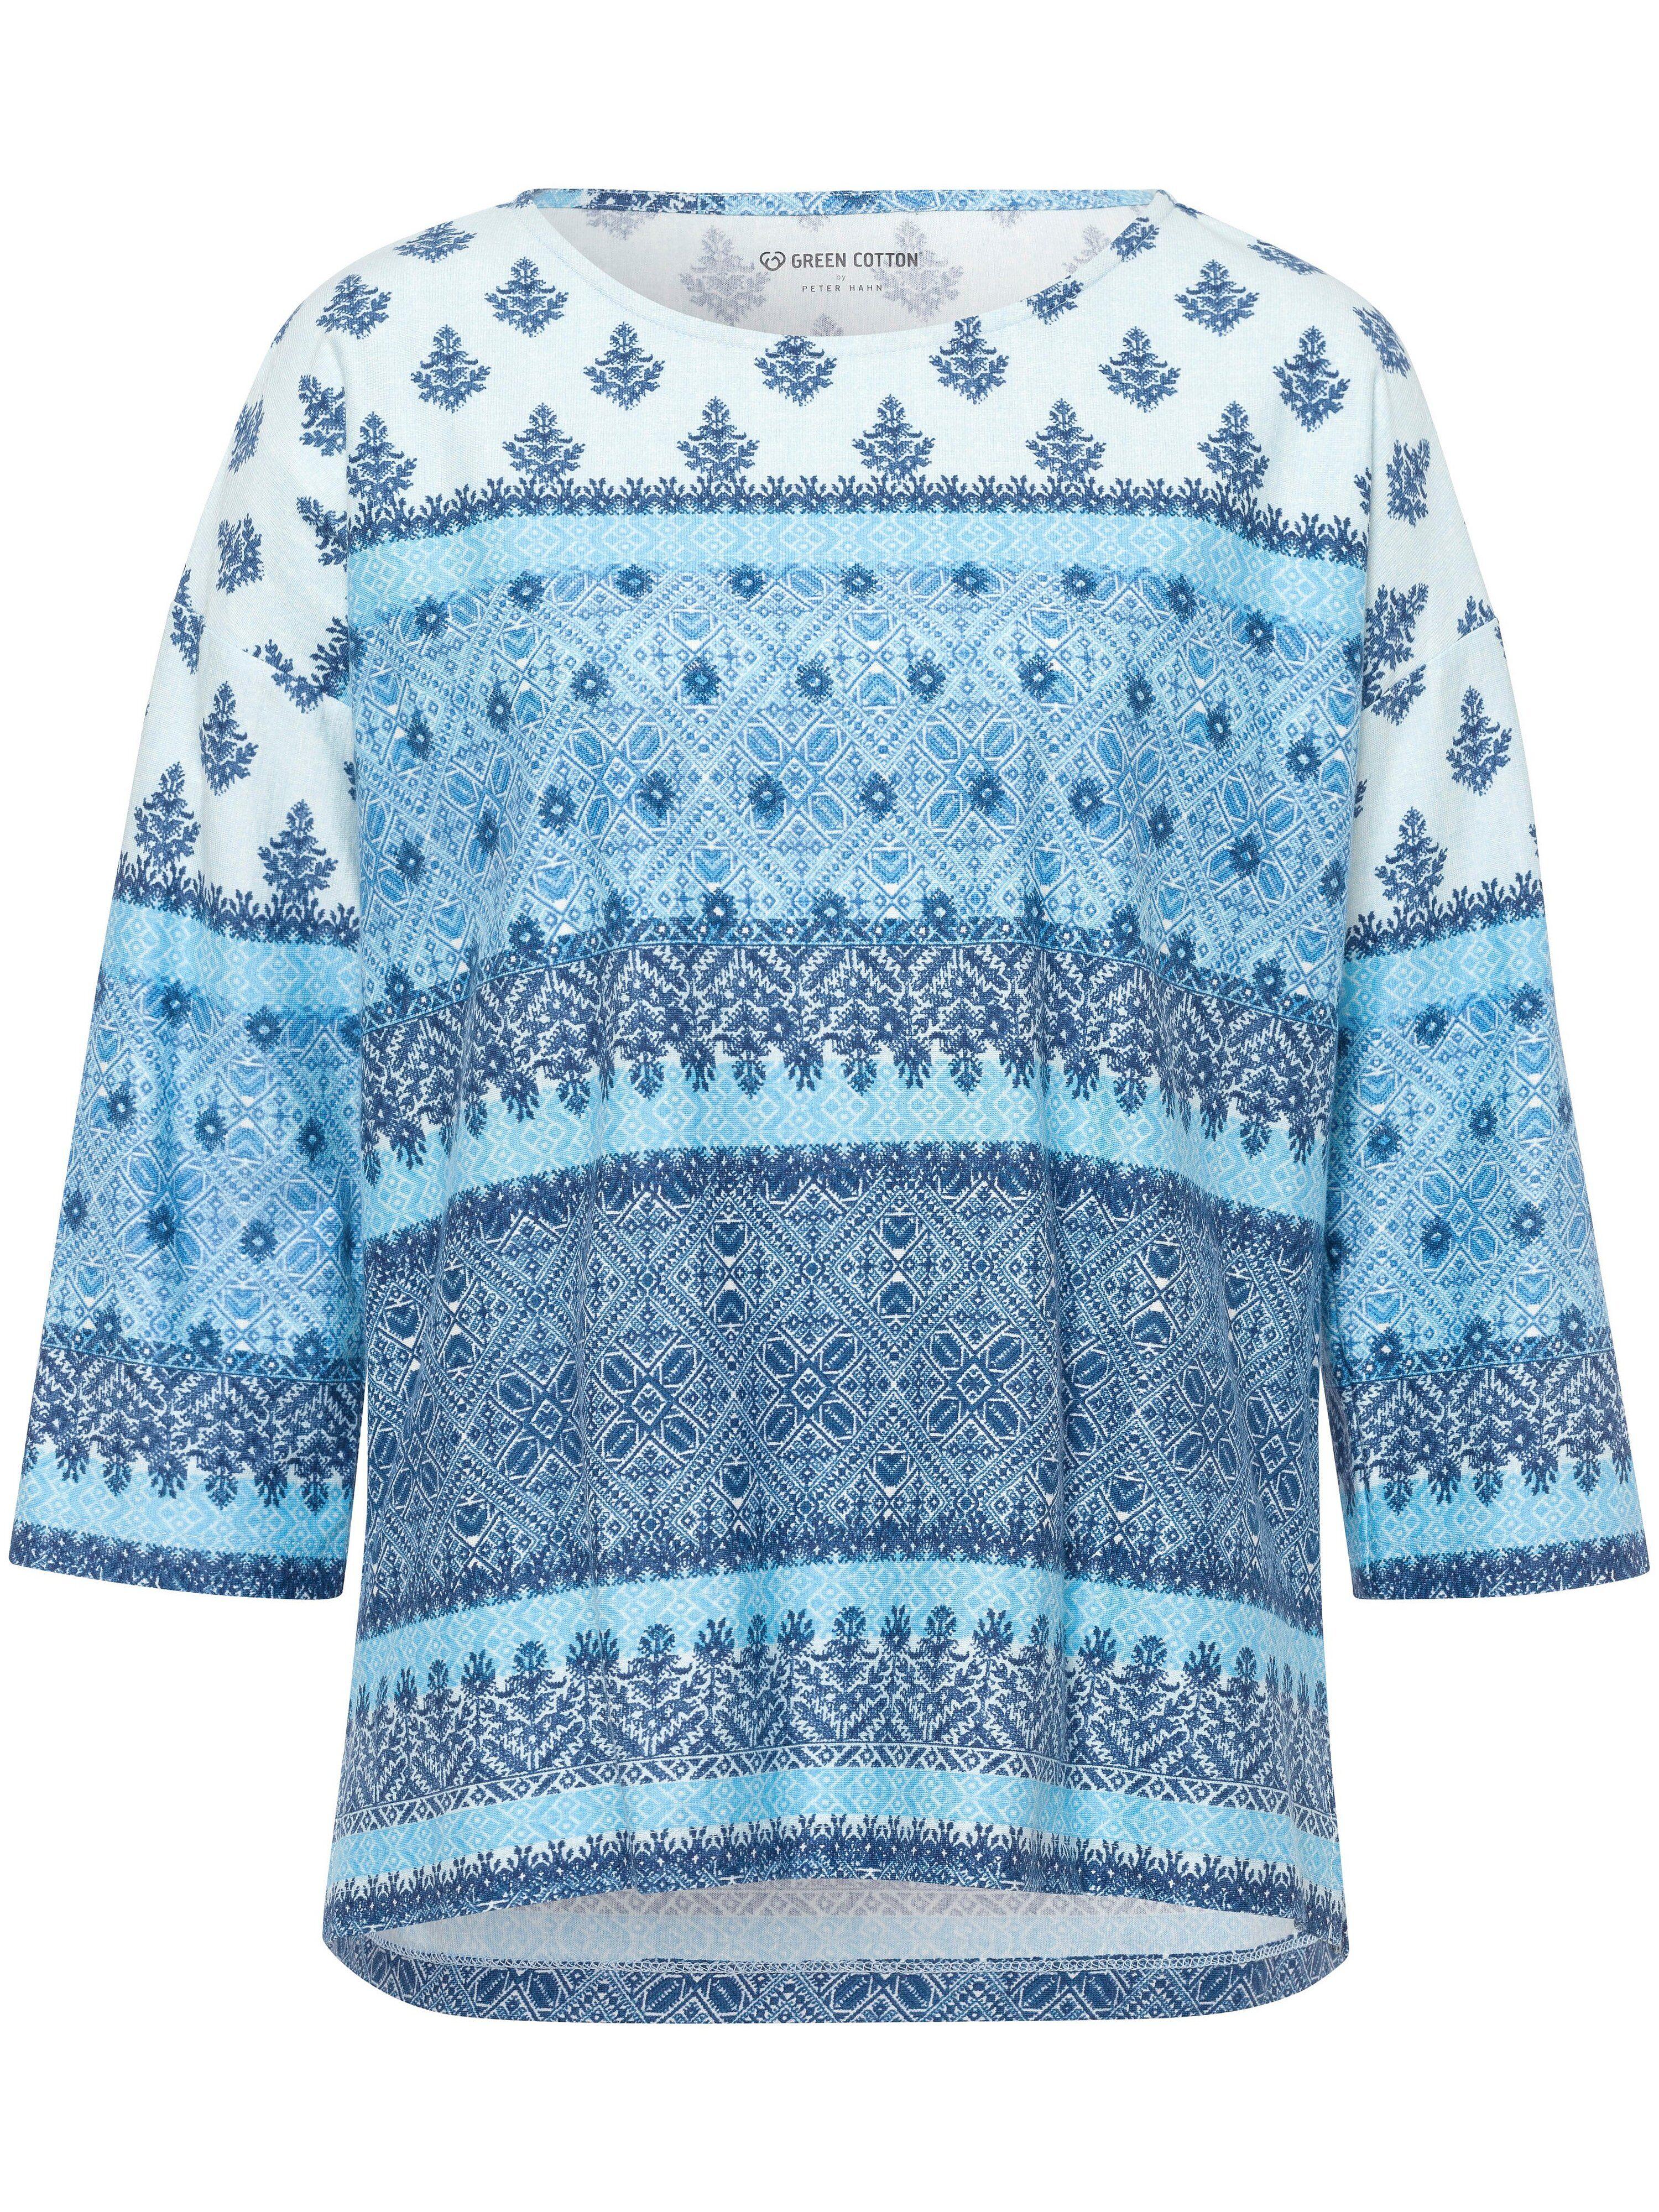 Green Cotton Le T-shirt 100% coton manches 3/4  Green Cotton bleu  - Femme - 50